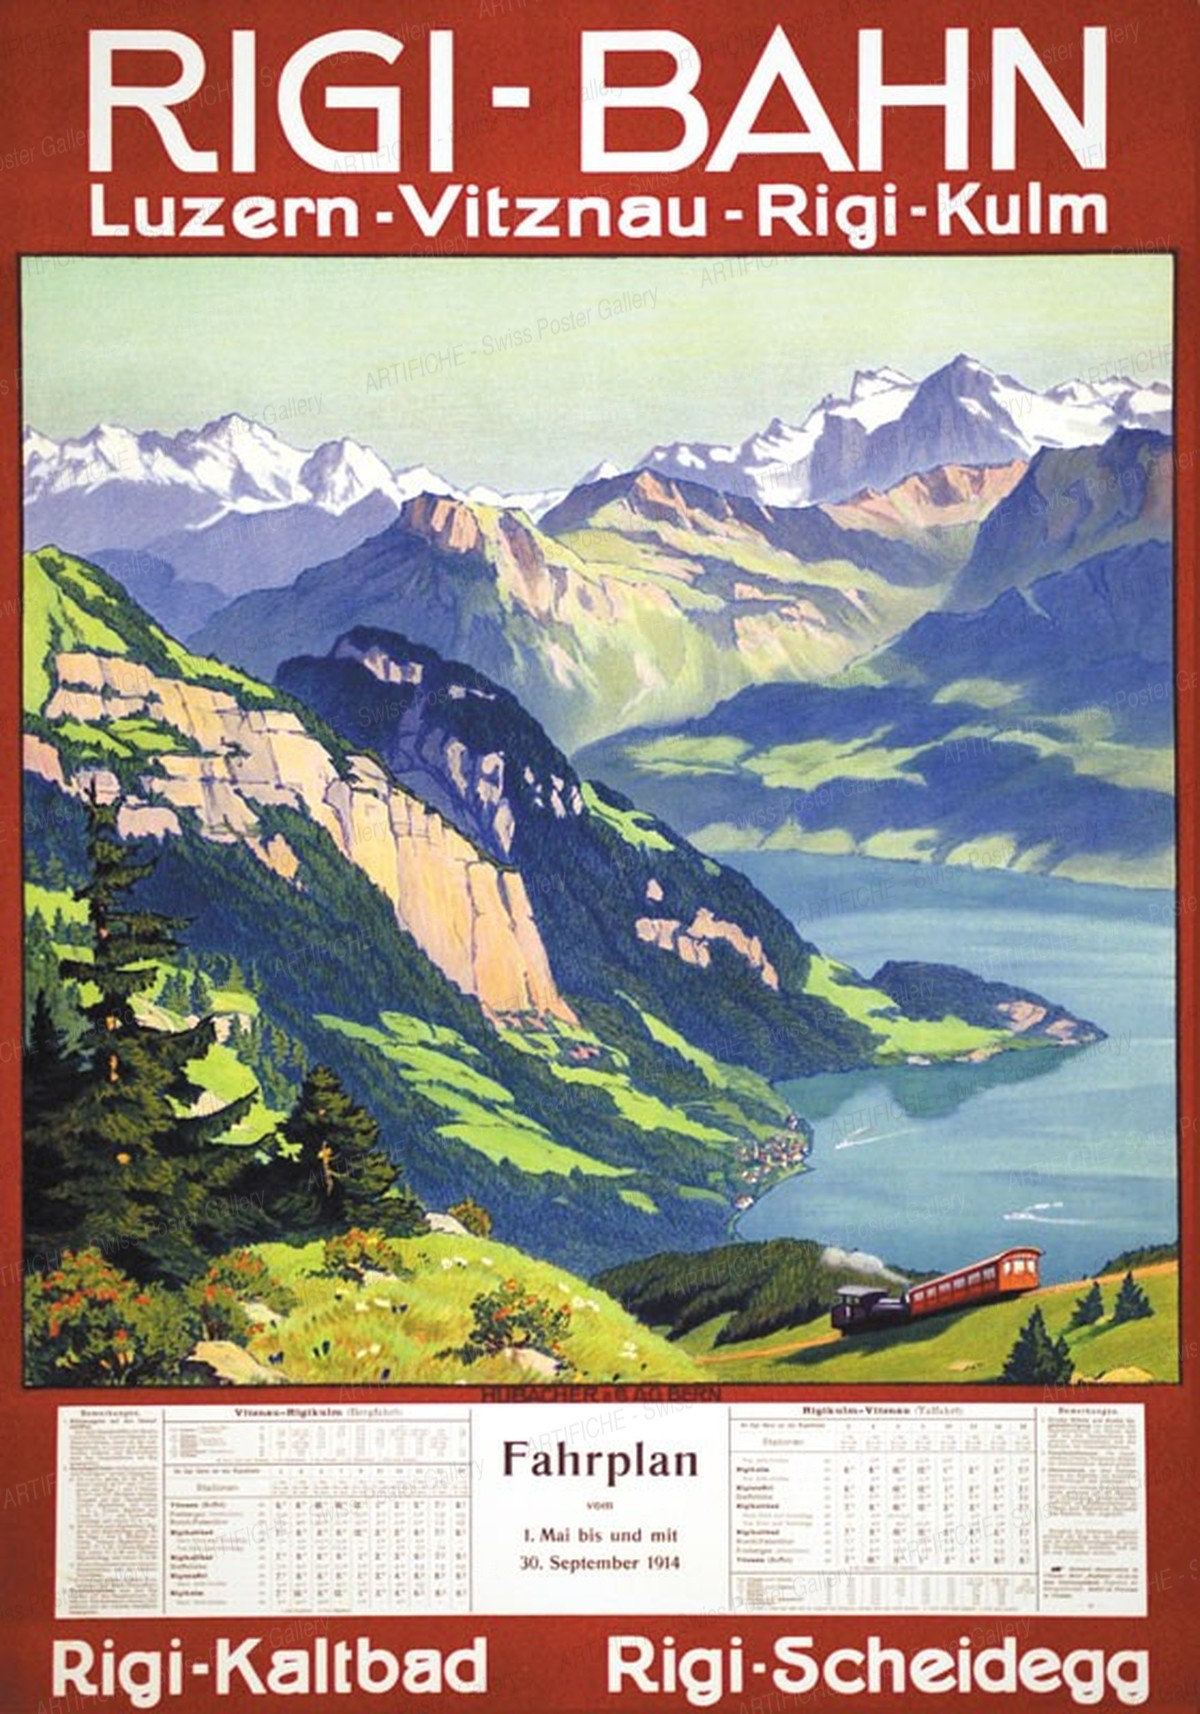 RIGI-BAHN Luzern Vitznau Rigi-Kulm – Rigi-Kaltbad – Rigi-Scheidegg, Artist unknown